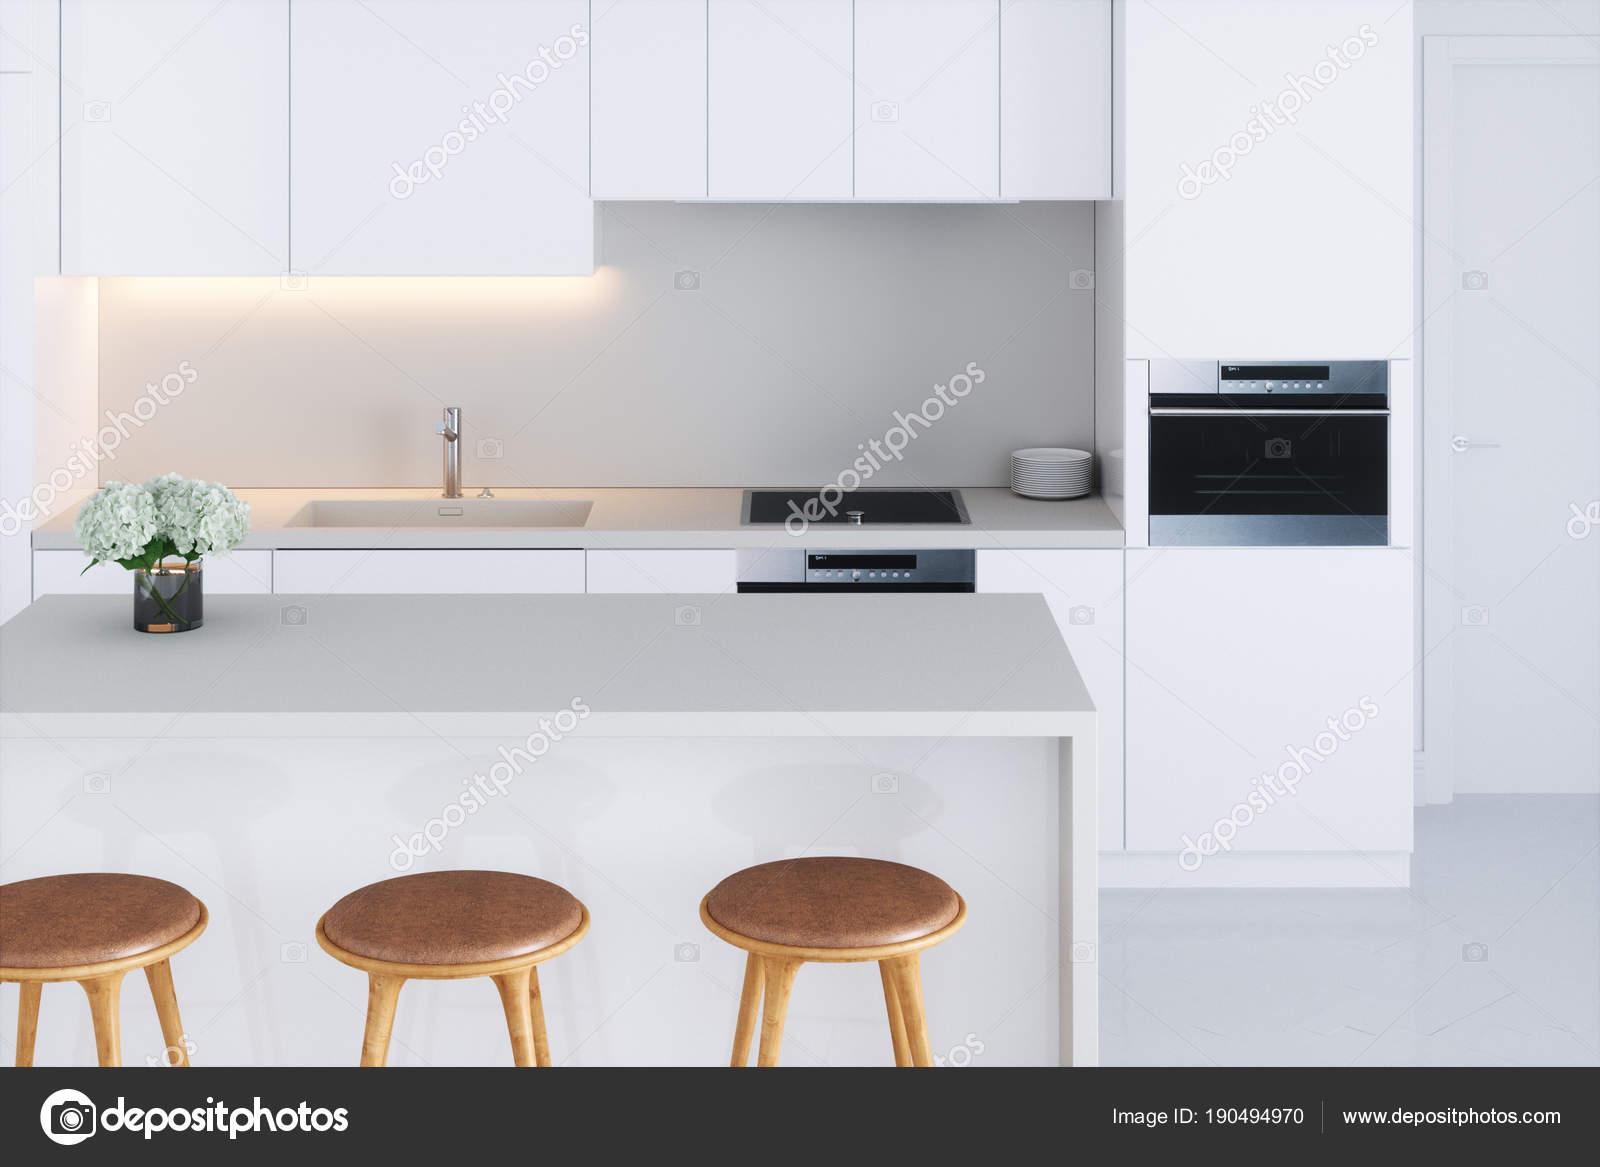 Witte Minimalistische Woonkeuken : Closeup witte minimalistische keuken d render u stockfoto viz